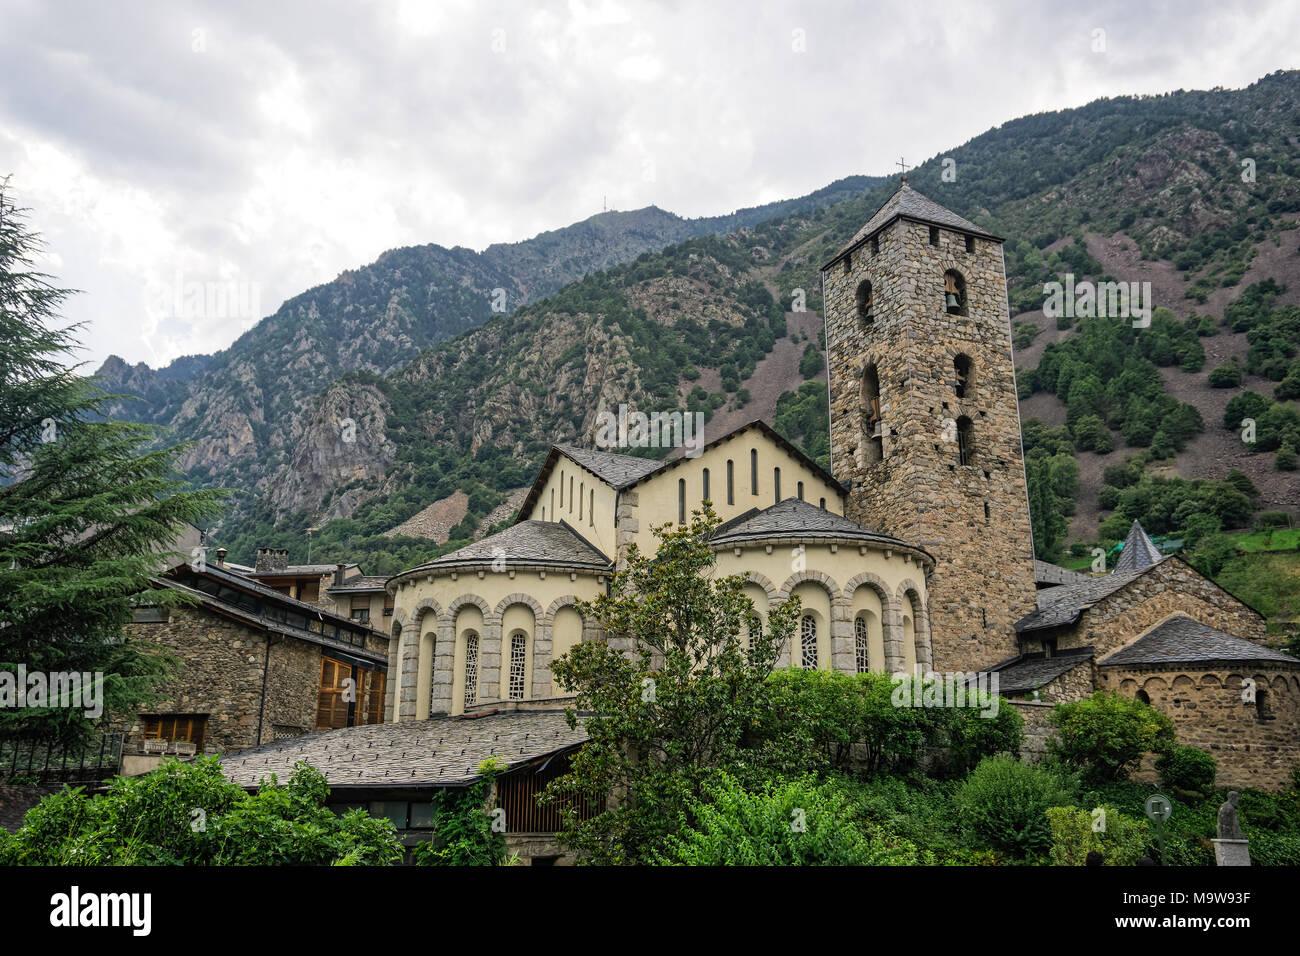 Andorral la Vella, Andorra The Chrurch of Sant Esteve facade.External of 12th century parish church Esglesia de Sant Esteve on the capital of Andorra. Stock Photo